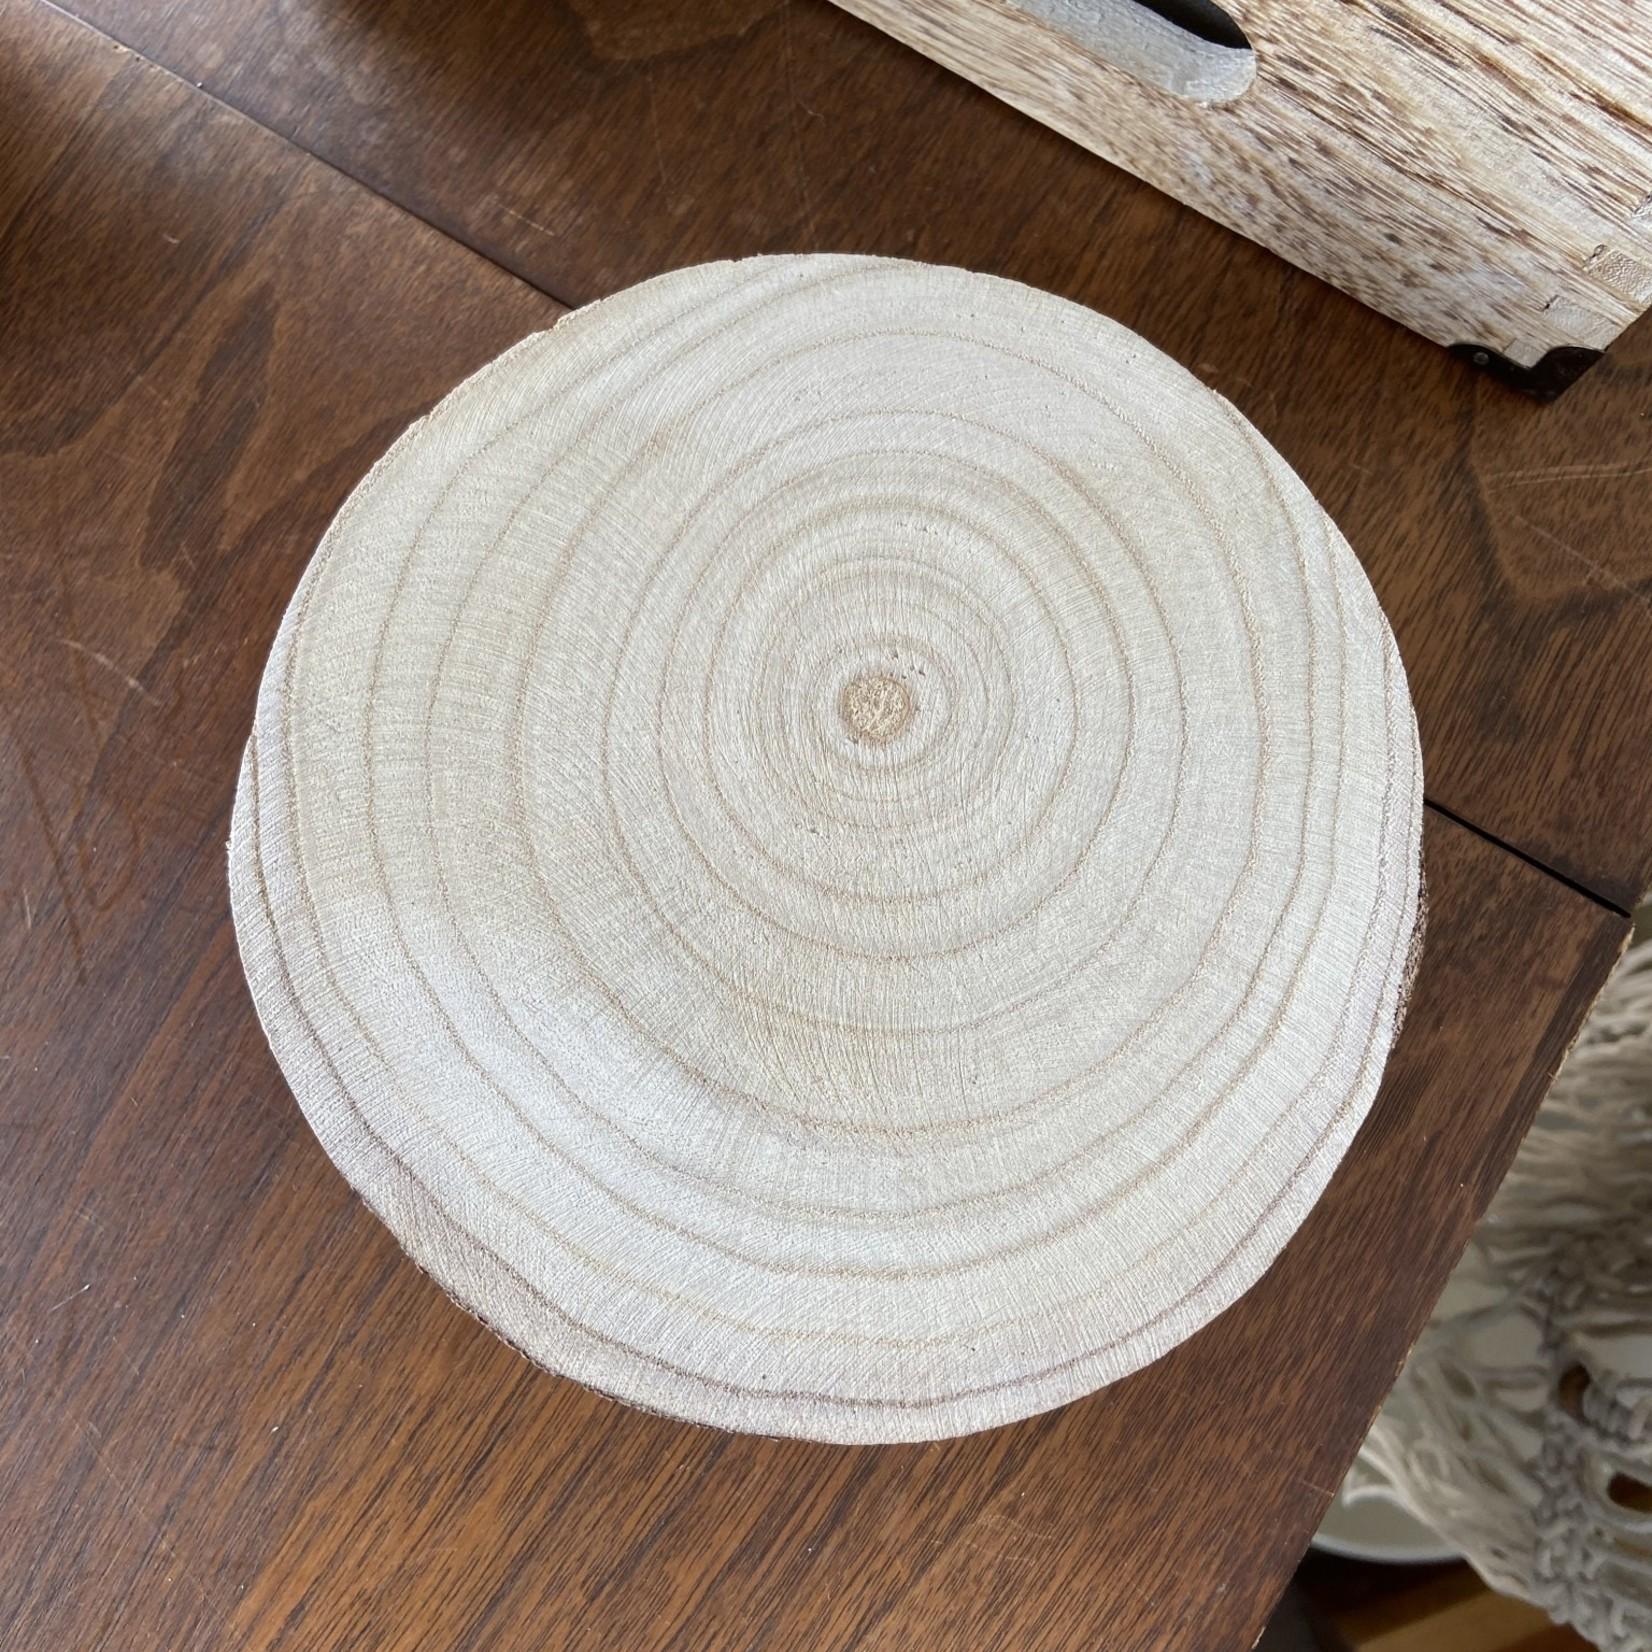 Santa Barbara Designs Wood Riser Small